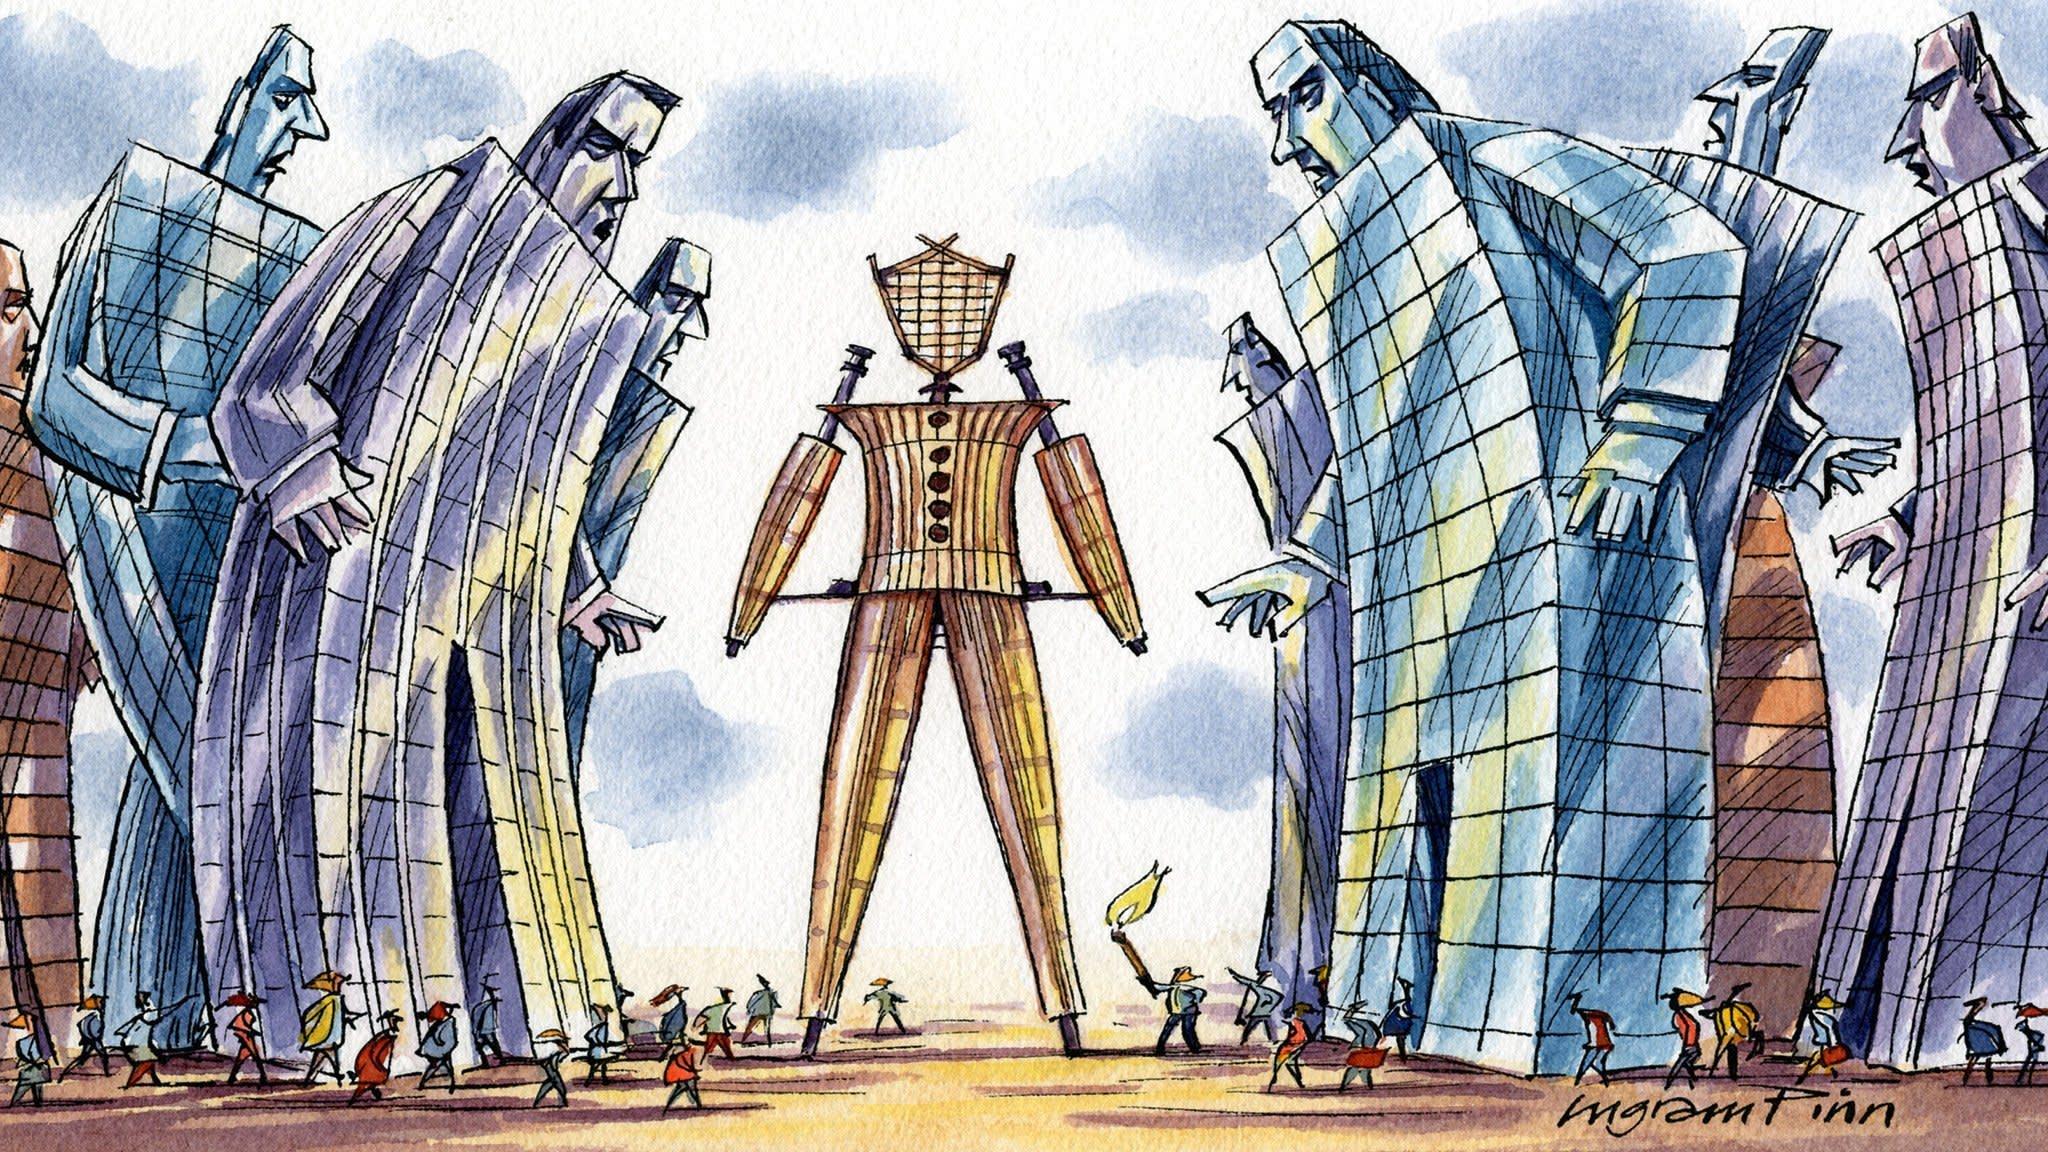 Superstar chief executives can self-destruct